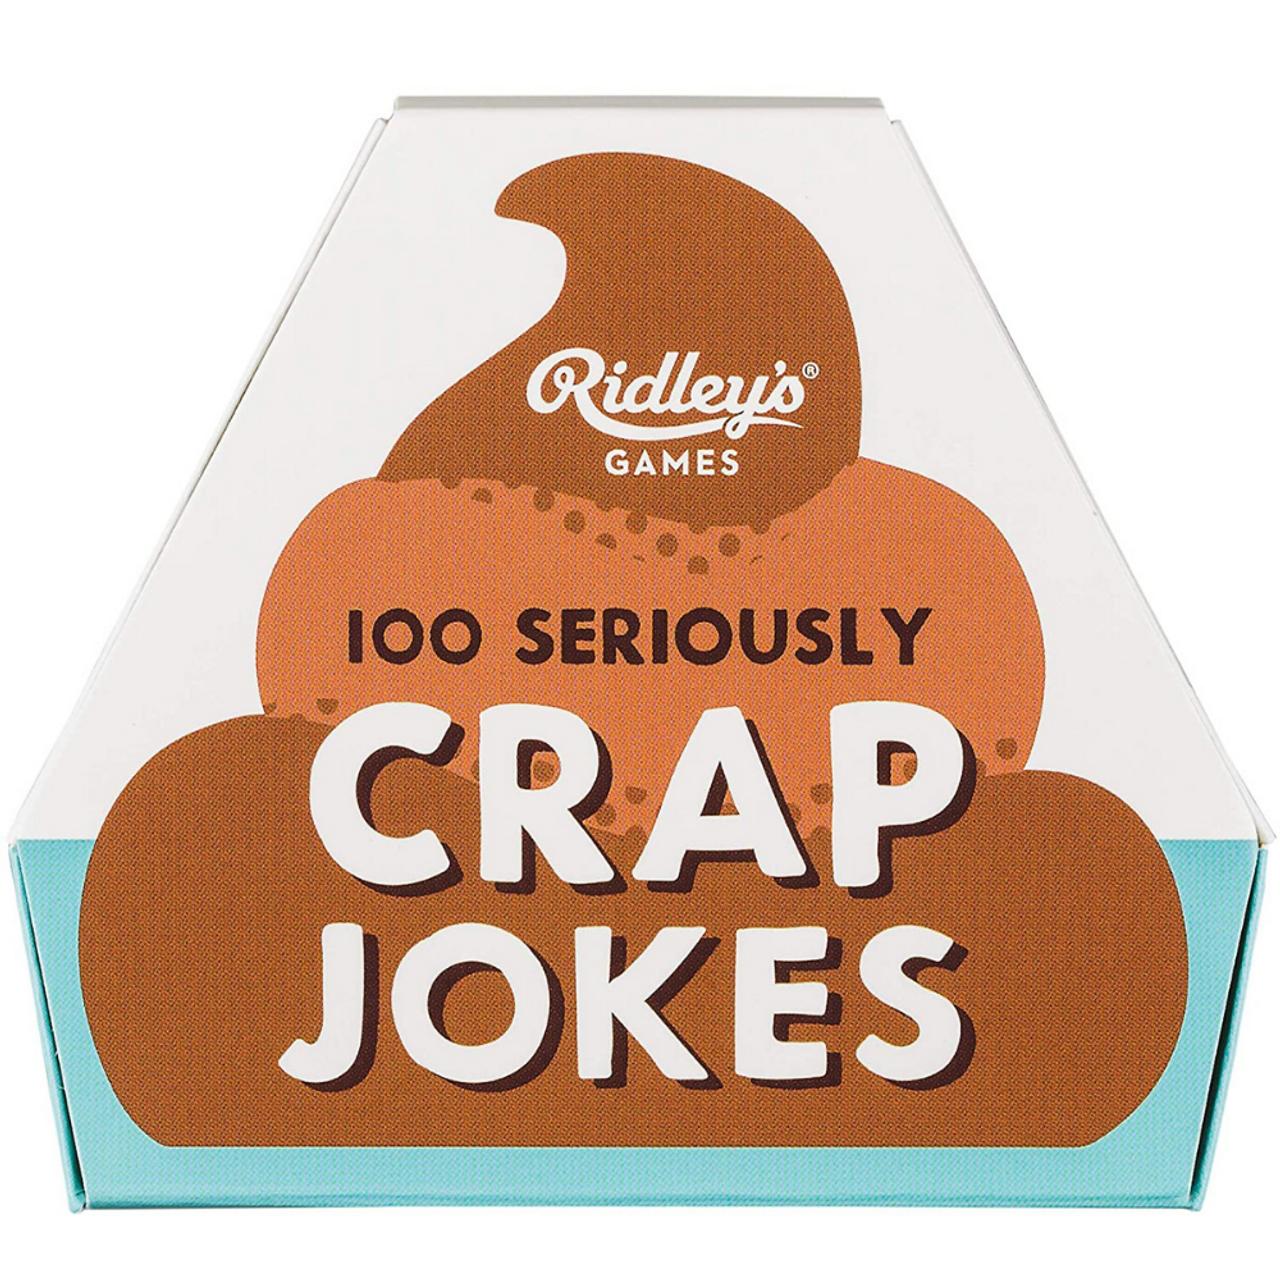 100 Seriously Crap Jokes